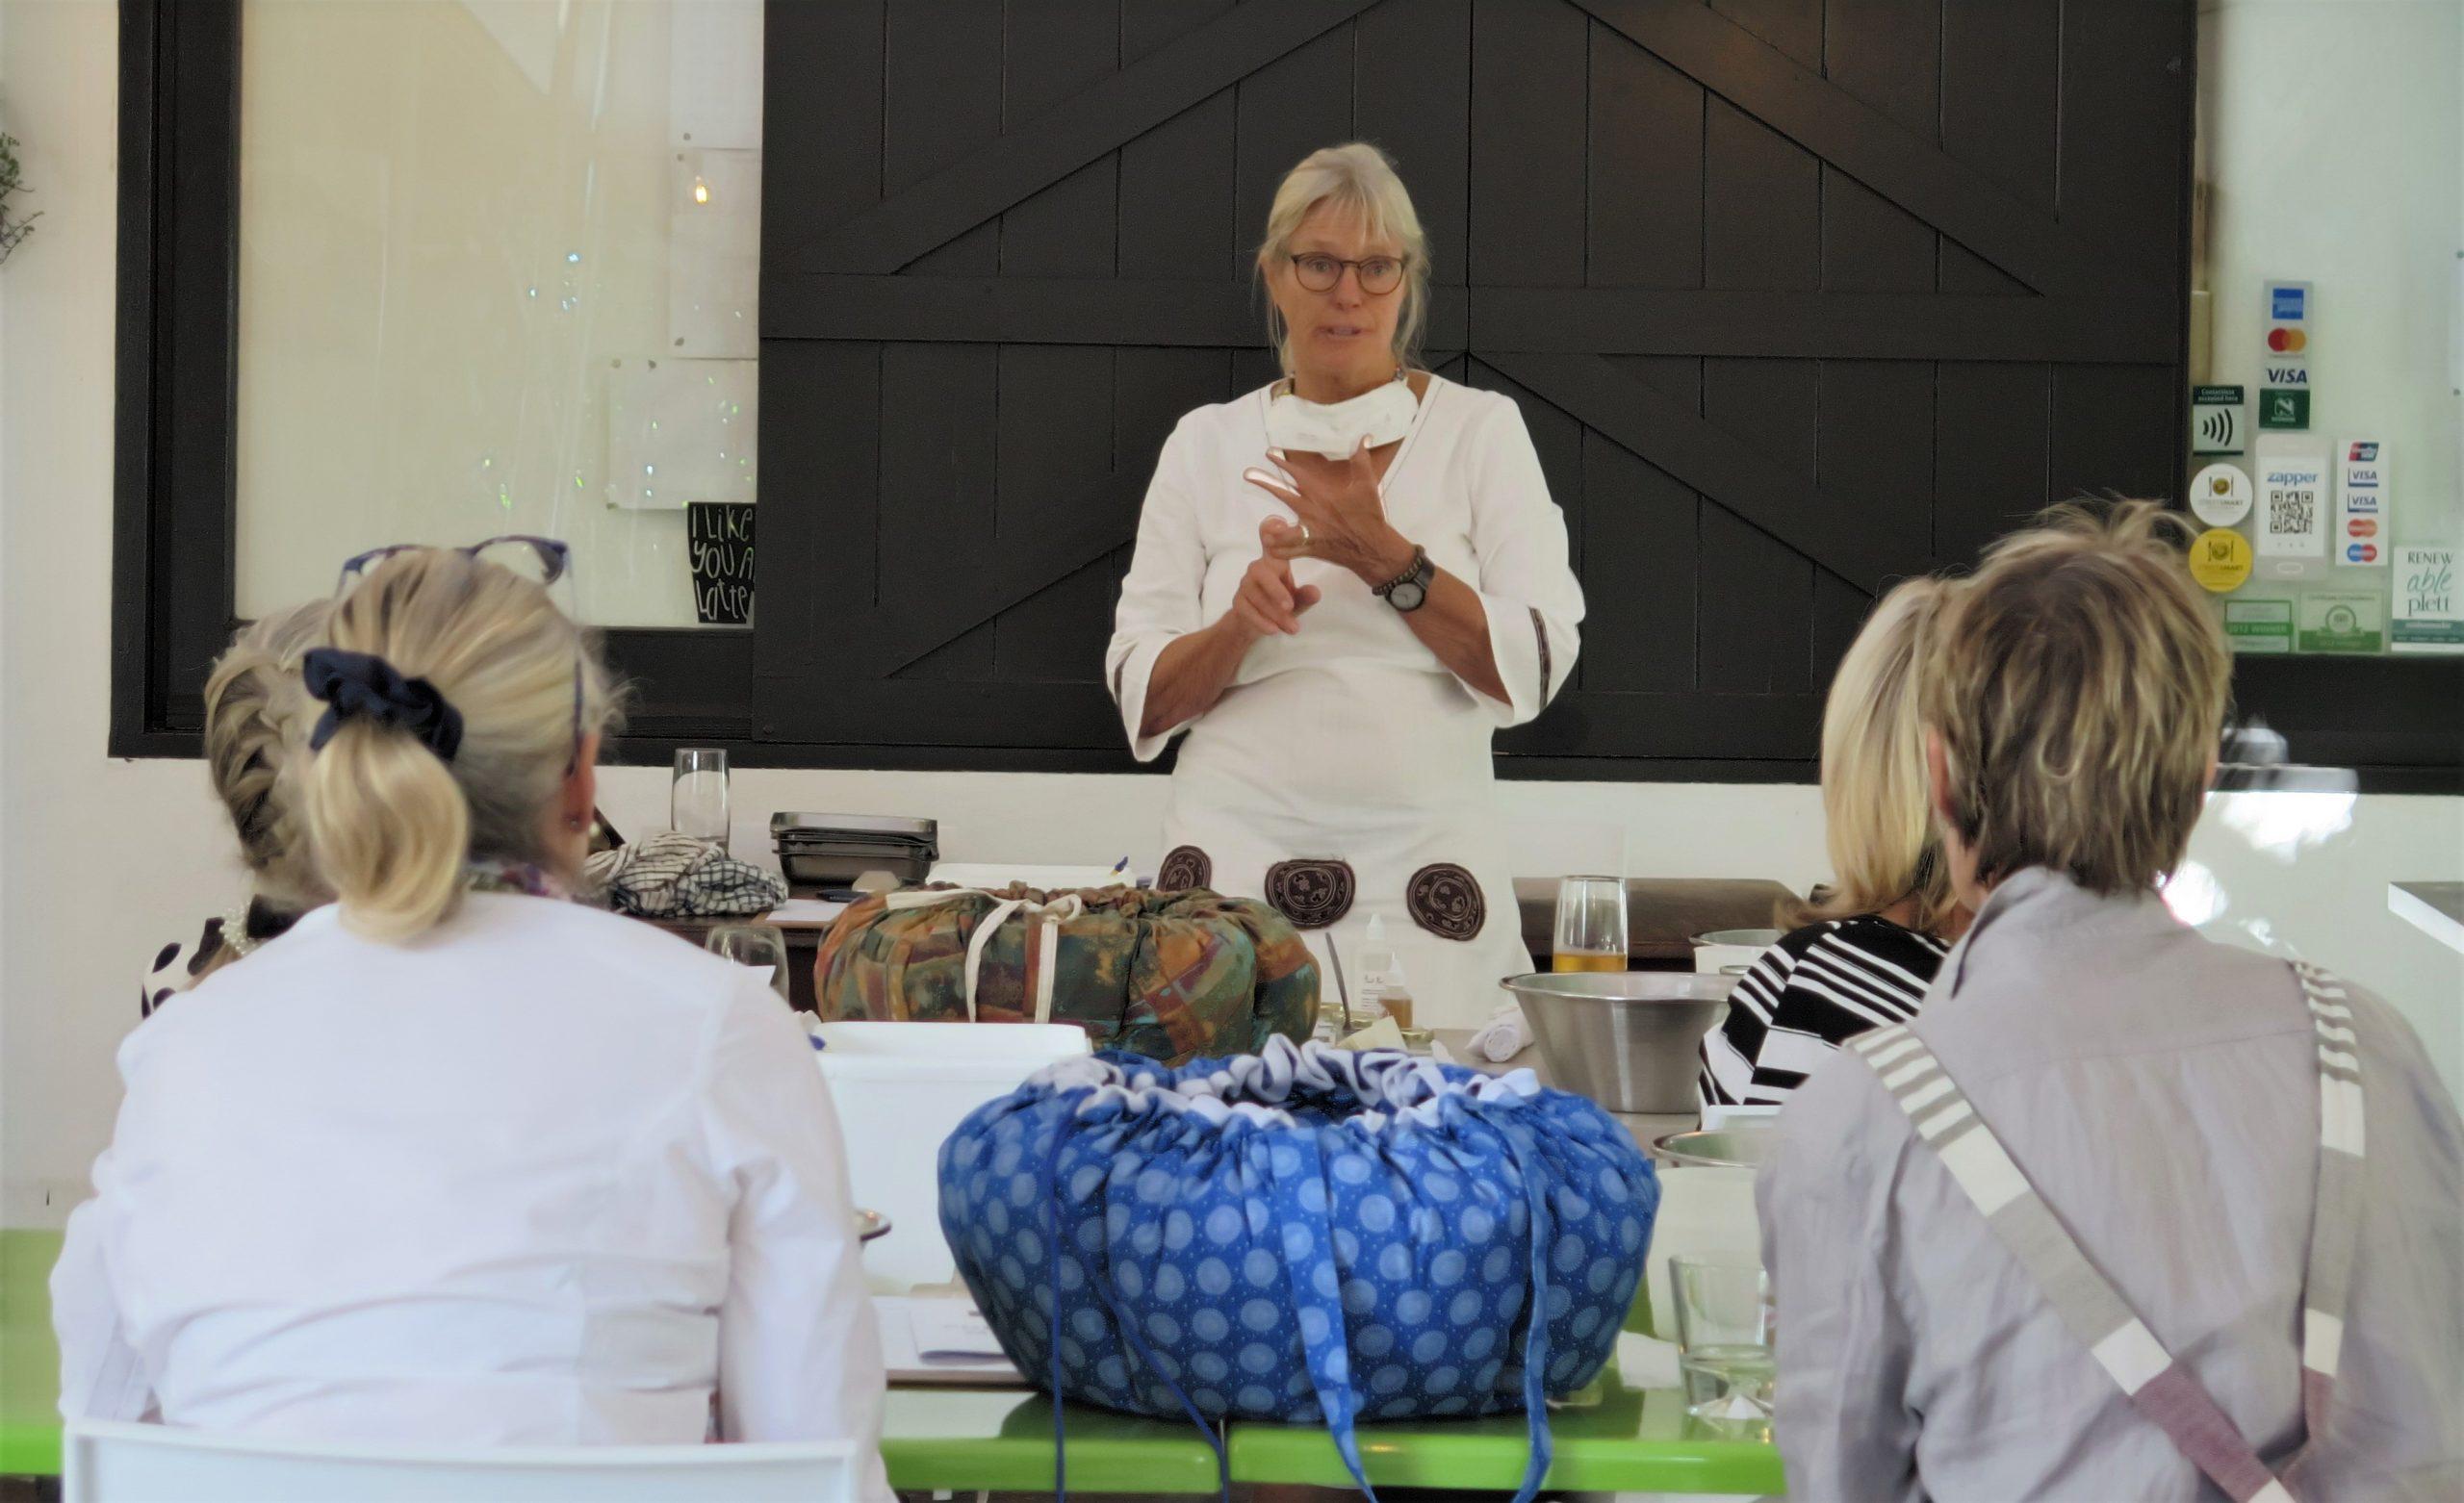 Finest Kind cheesemaking course in Plett